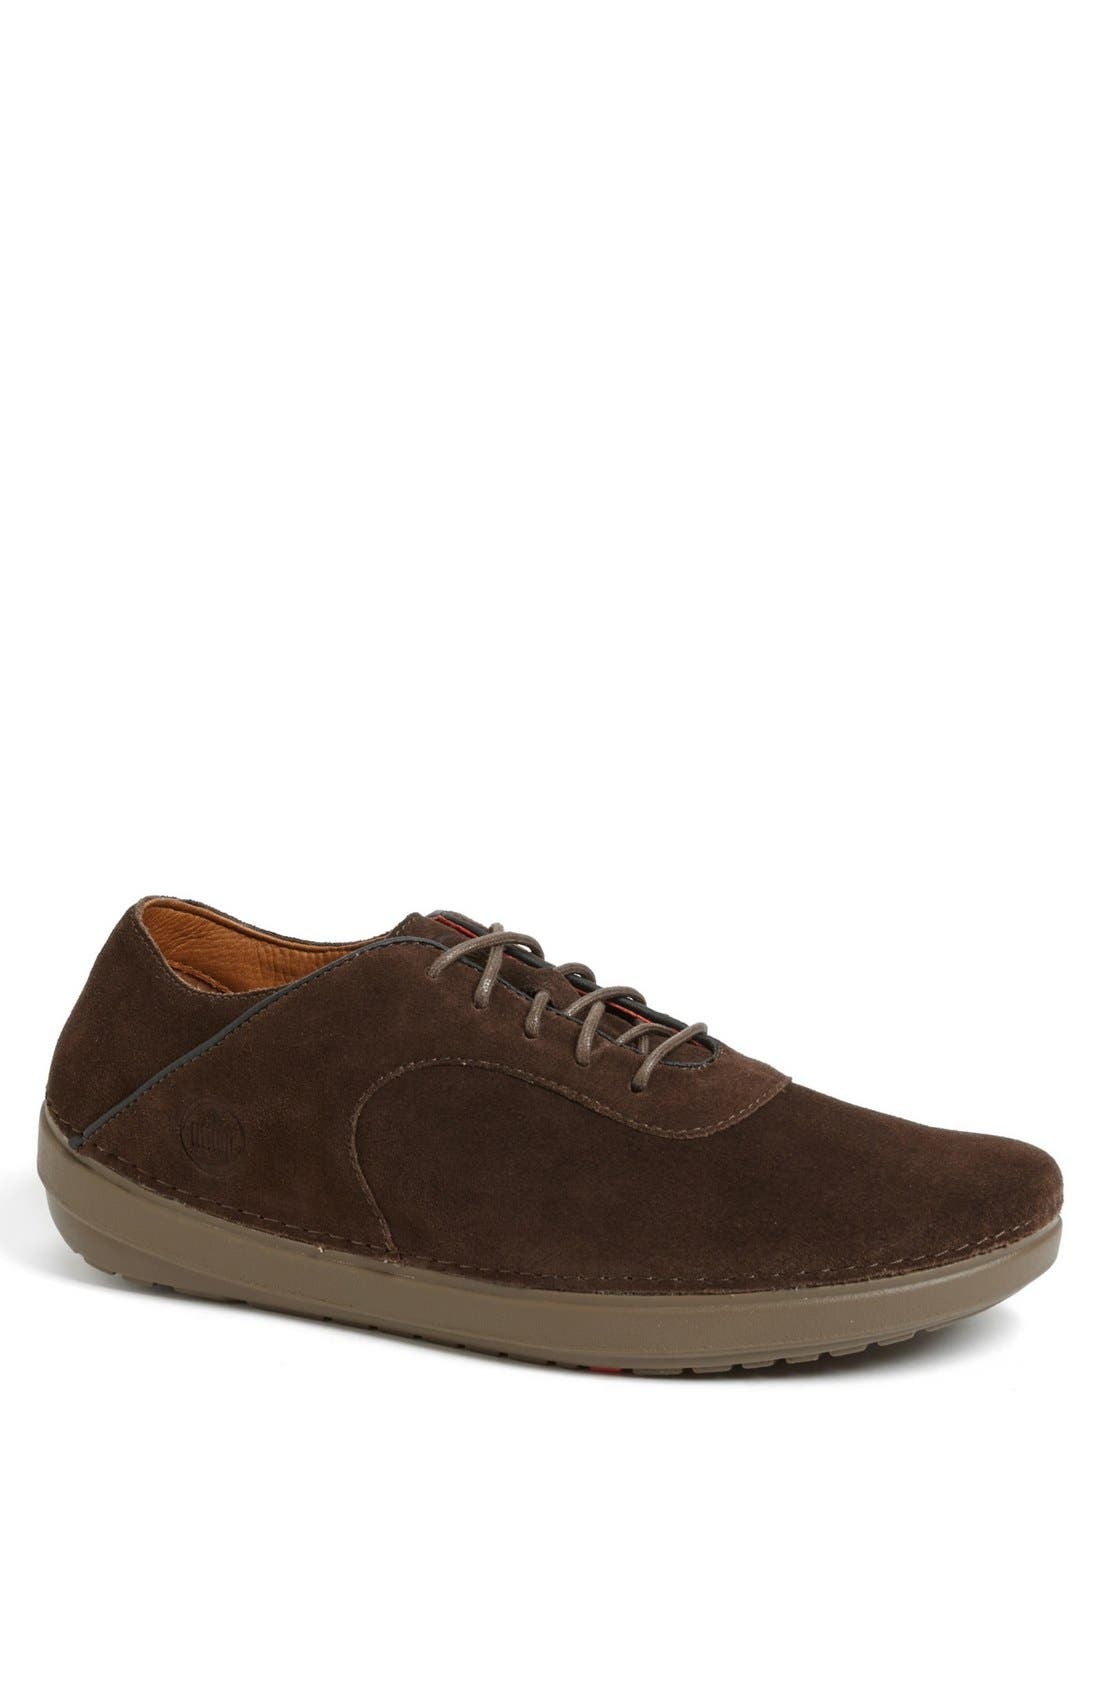 Main Image - FitFlop 'Flex™' Suede Sneaker (Men)